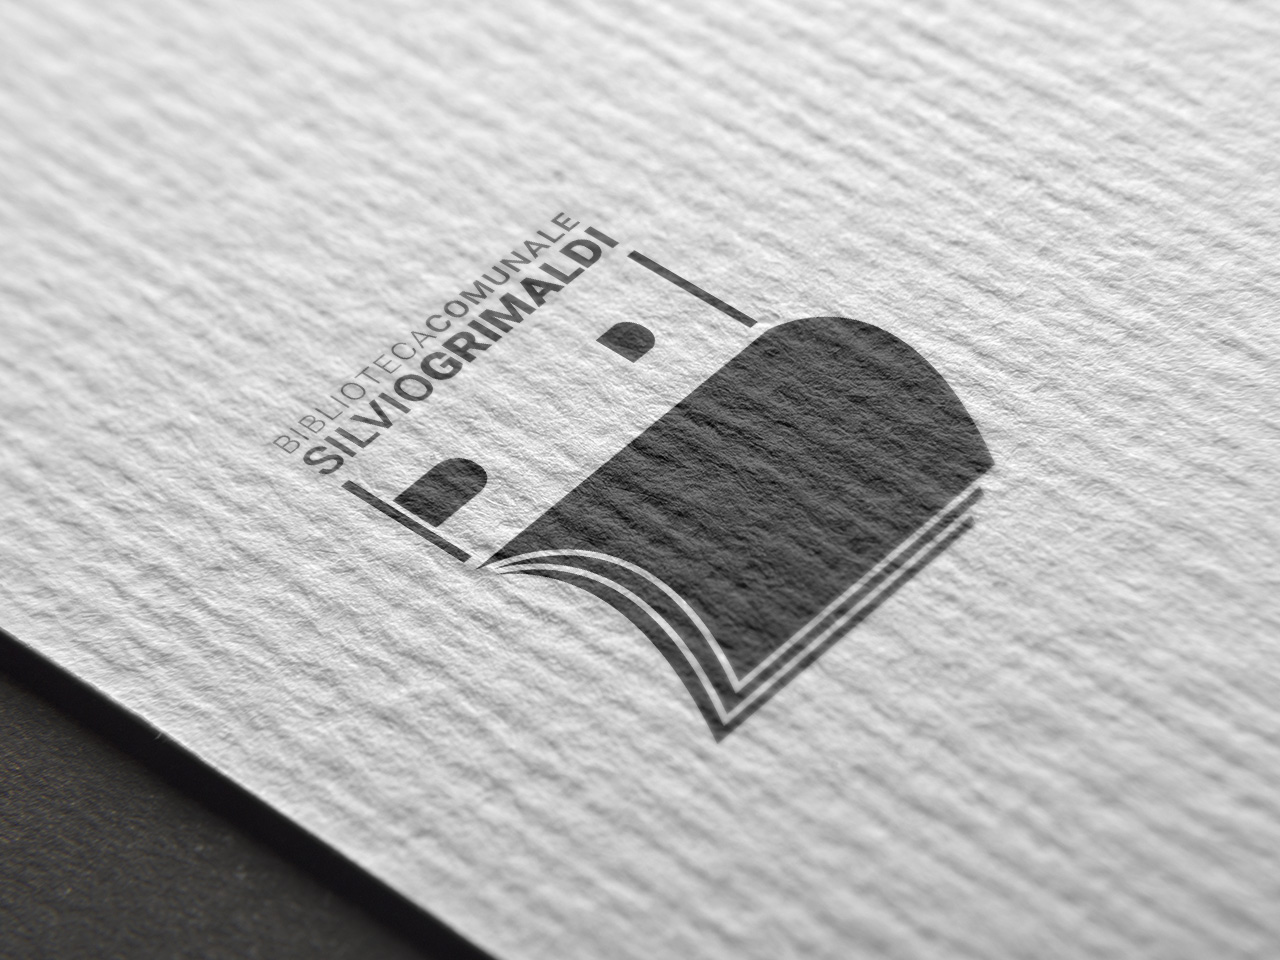 CON_logo_bibliotecarivalta_00